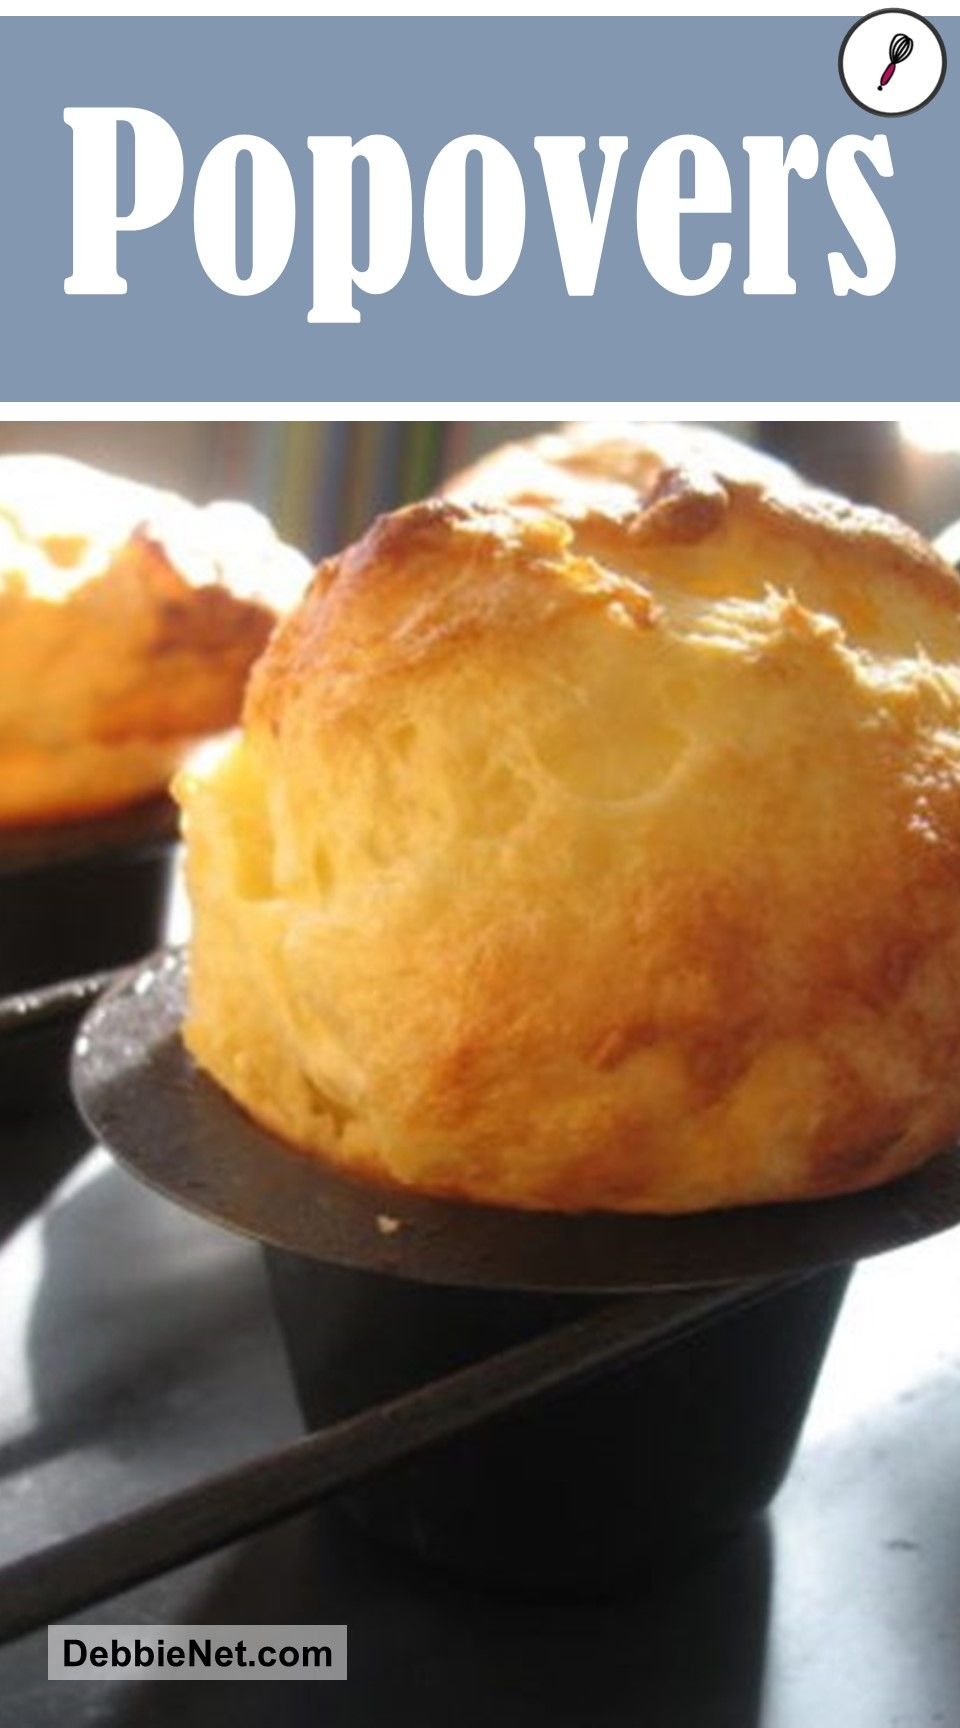 Light And Fluffy Popovers Debbienet Com Yorkshire Pudding Recipes Popover Recipe Easy Popover Recipe